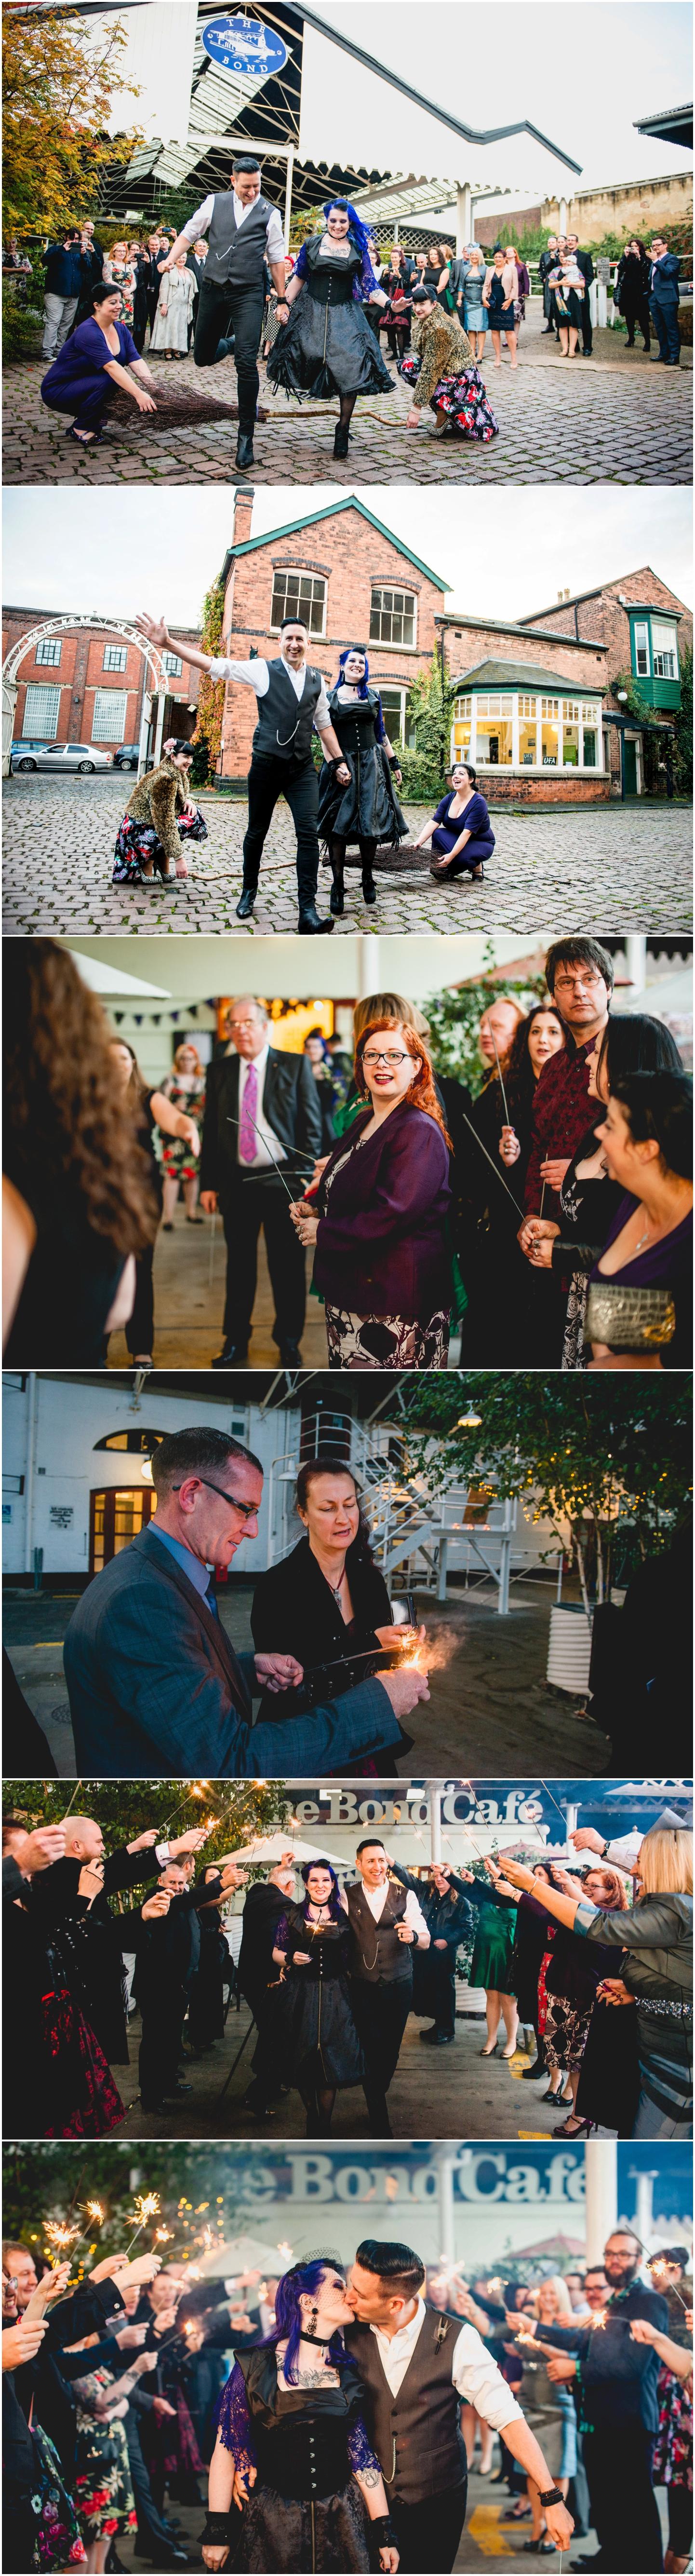 Bond Company Wedding, Digbeth, Lisa Carpenter Photography, Birmingham, goth wedding, alternative wedding, photos, sparklers, sparkler exit